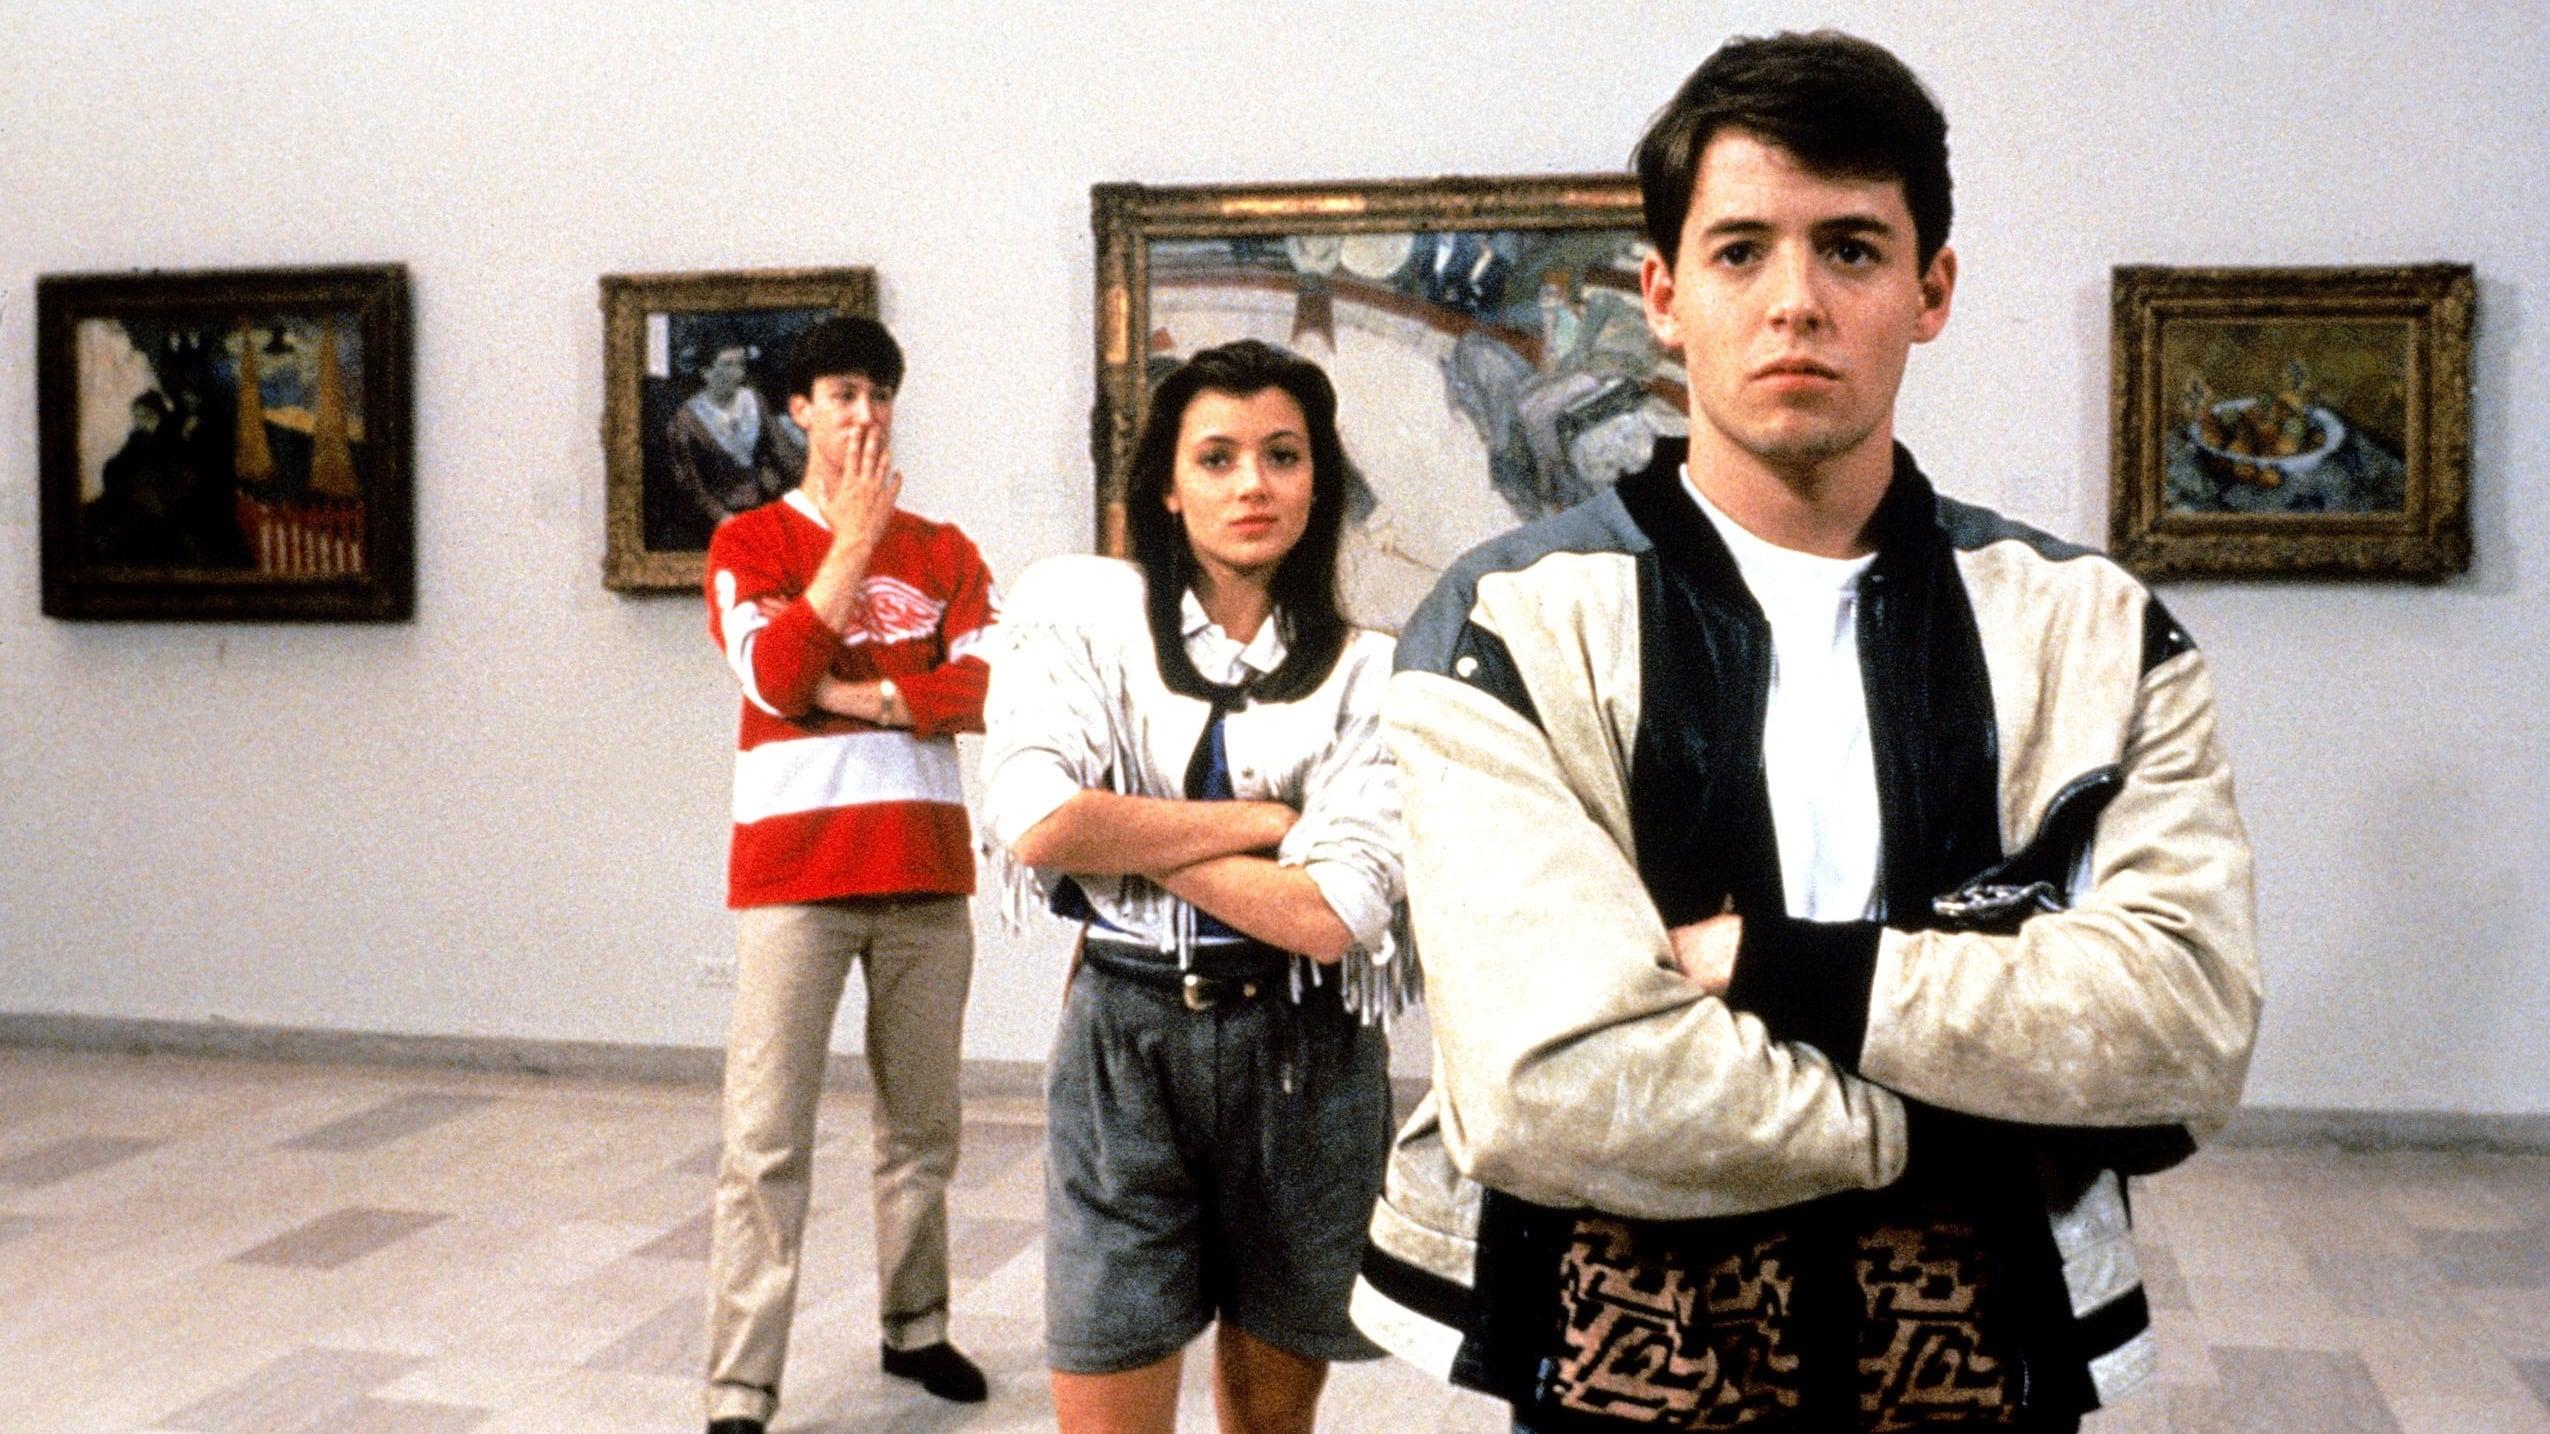 Regarder La folle journée de Ferris Bueller en streaming gratuit